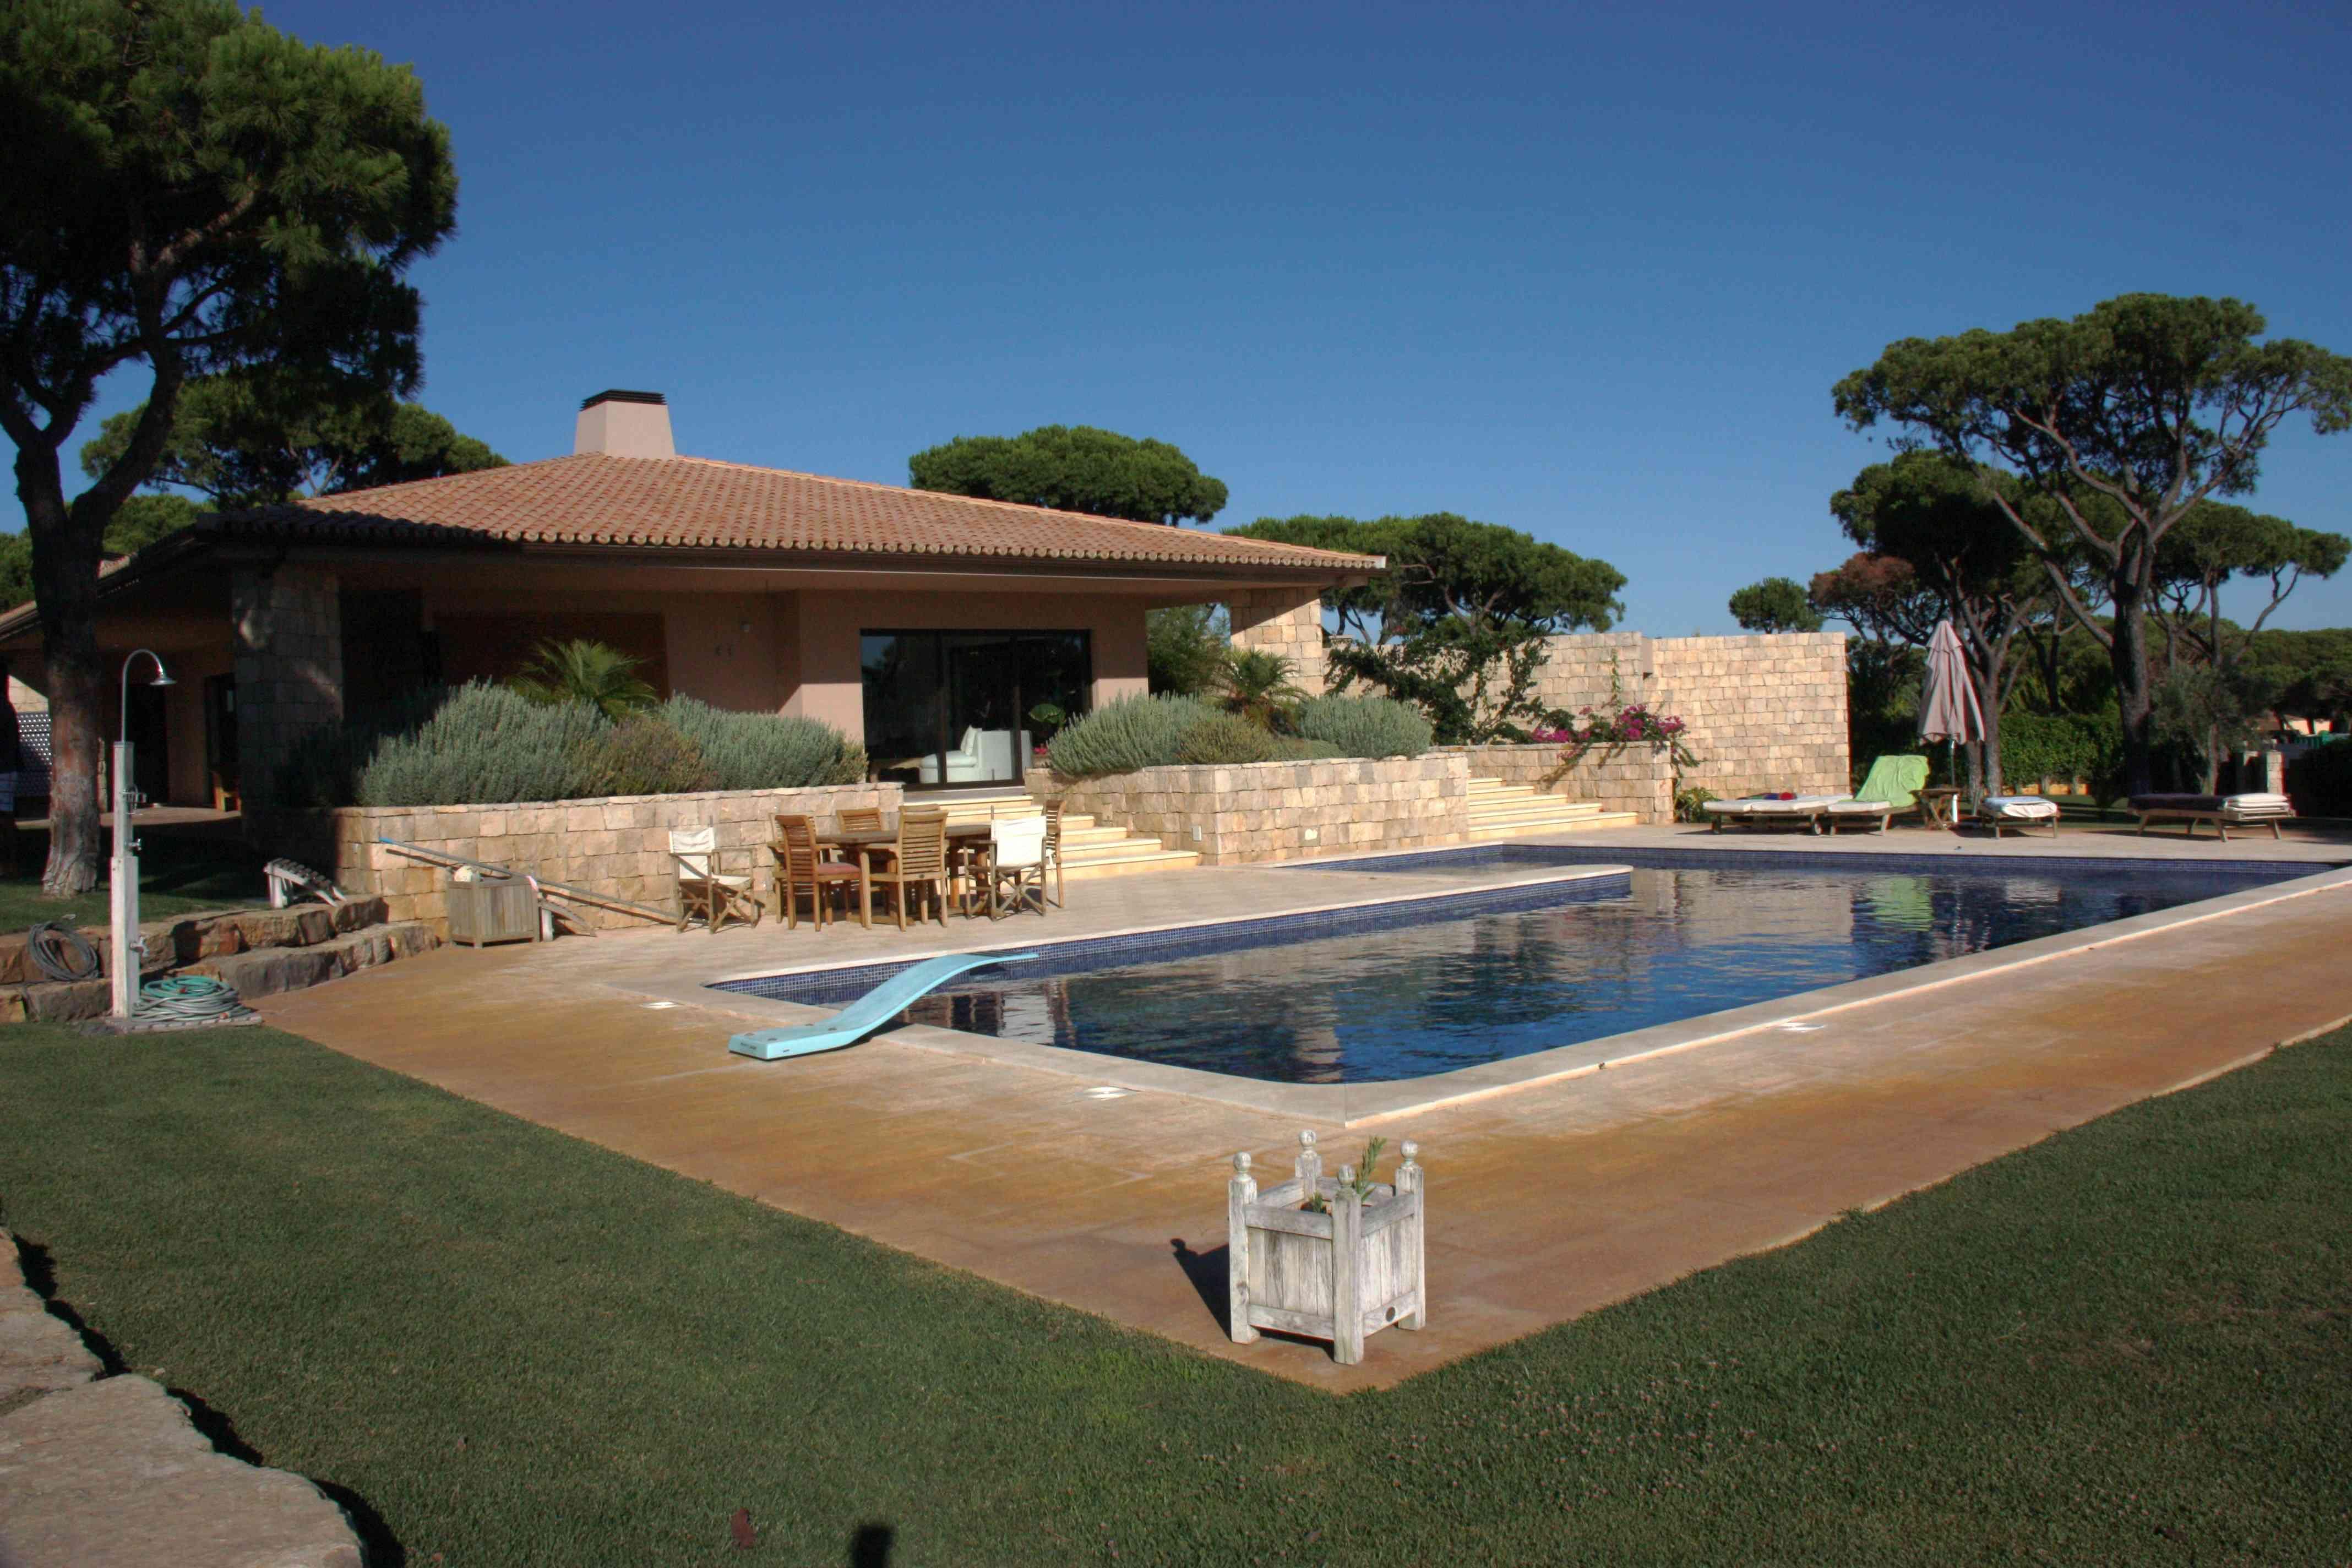 Casa de luxo de Cristiano Ronaldo no Algarve atrai investidores